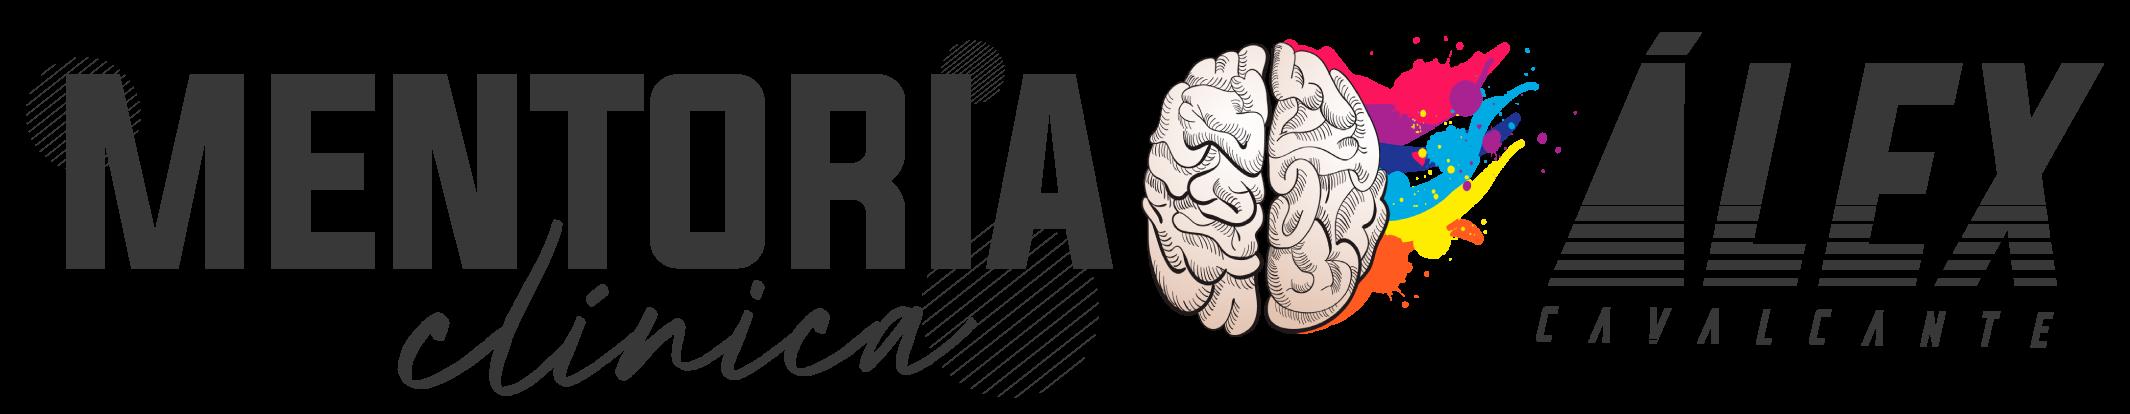 Álex Cavalcante Neuropsicoterapeuta Psicanalista Mentoria Clínica Terapeuta Ansiedade Depressão Estresse PulsõesPsicanálise Psicólogo Eneagrama Medos Desejos Florianópolis São Paulo Paulista Catarinense